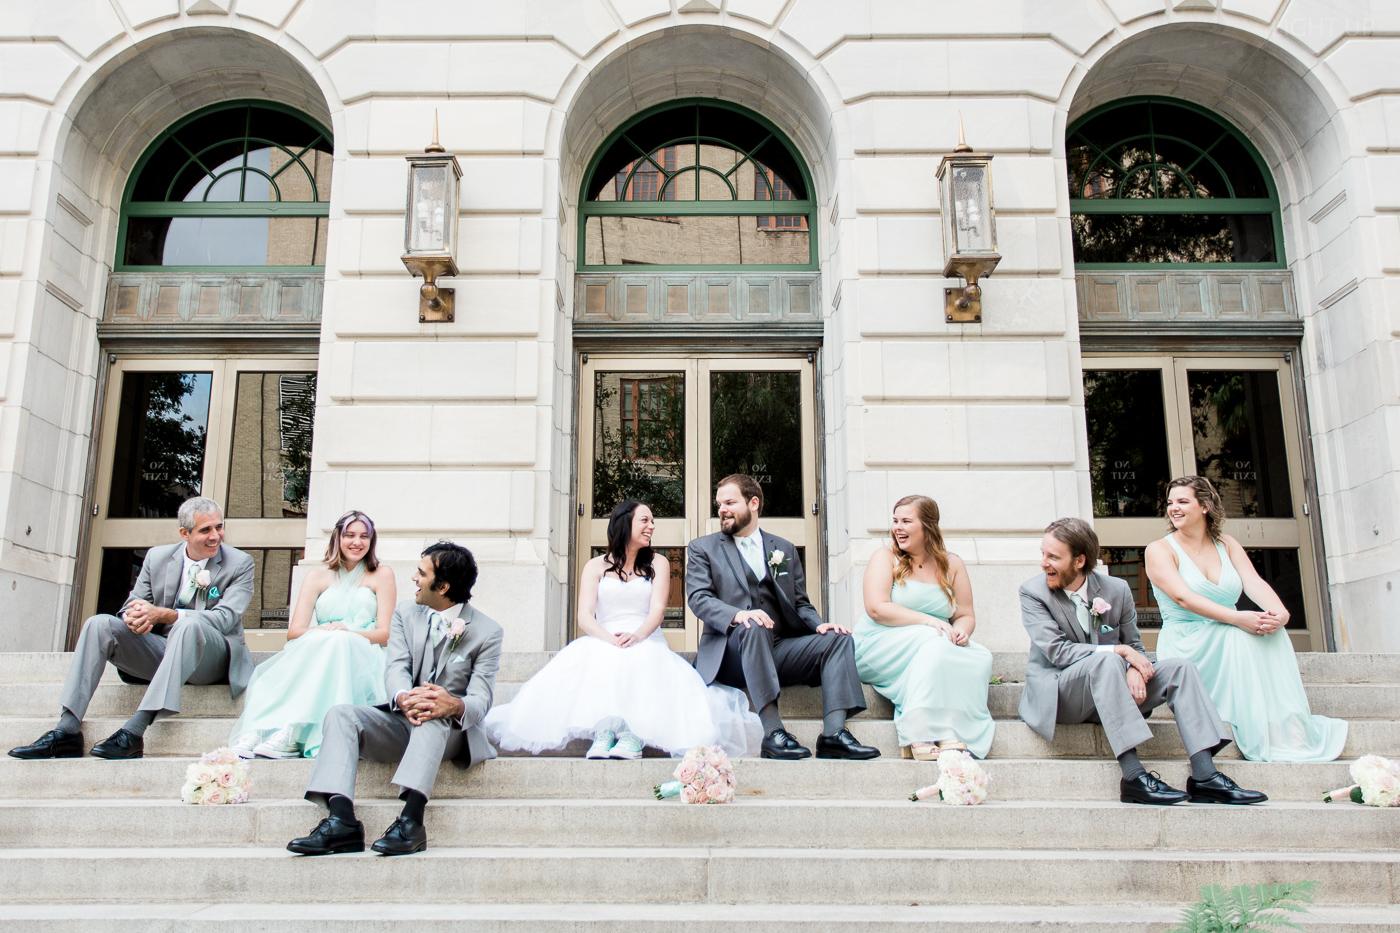 bridal-party-ideas-4.jpg